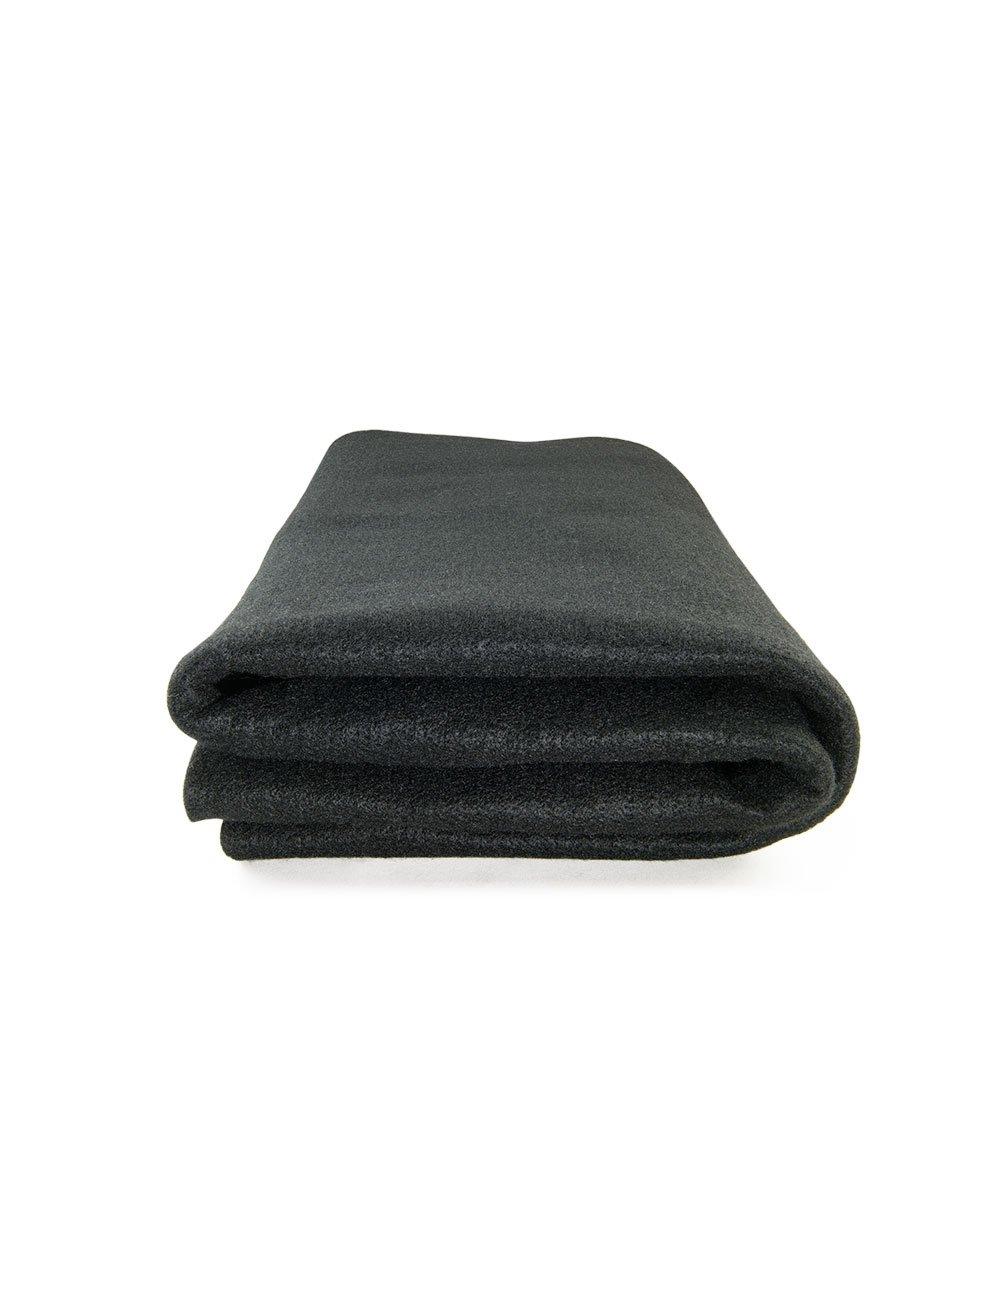 High Temp Felt Welding Blanket: 6' X 4', Black